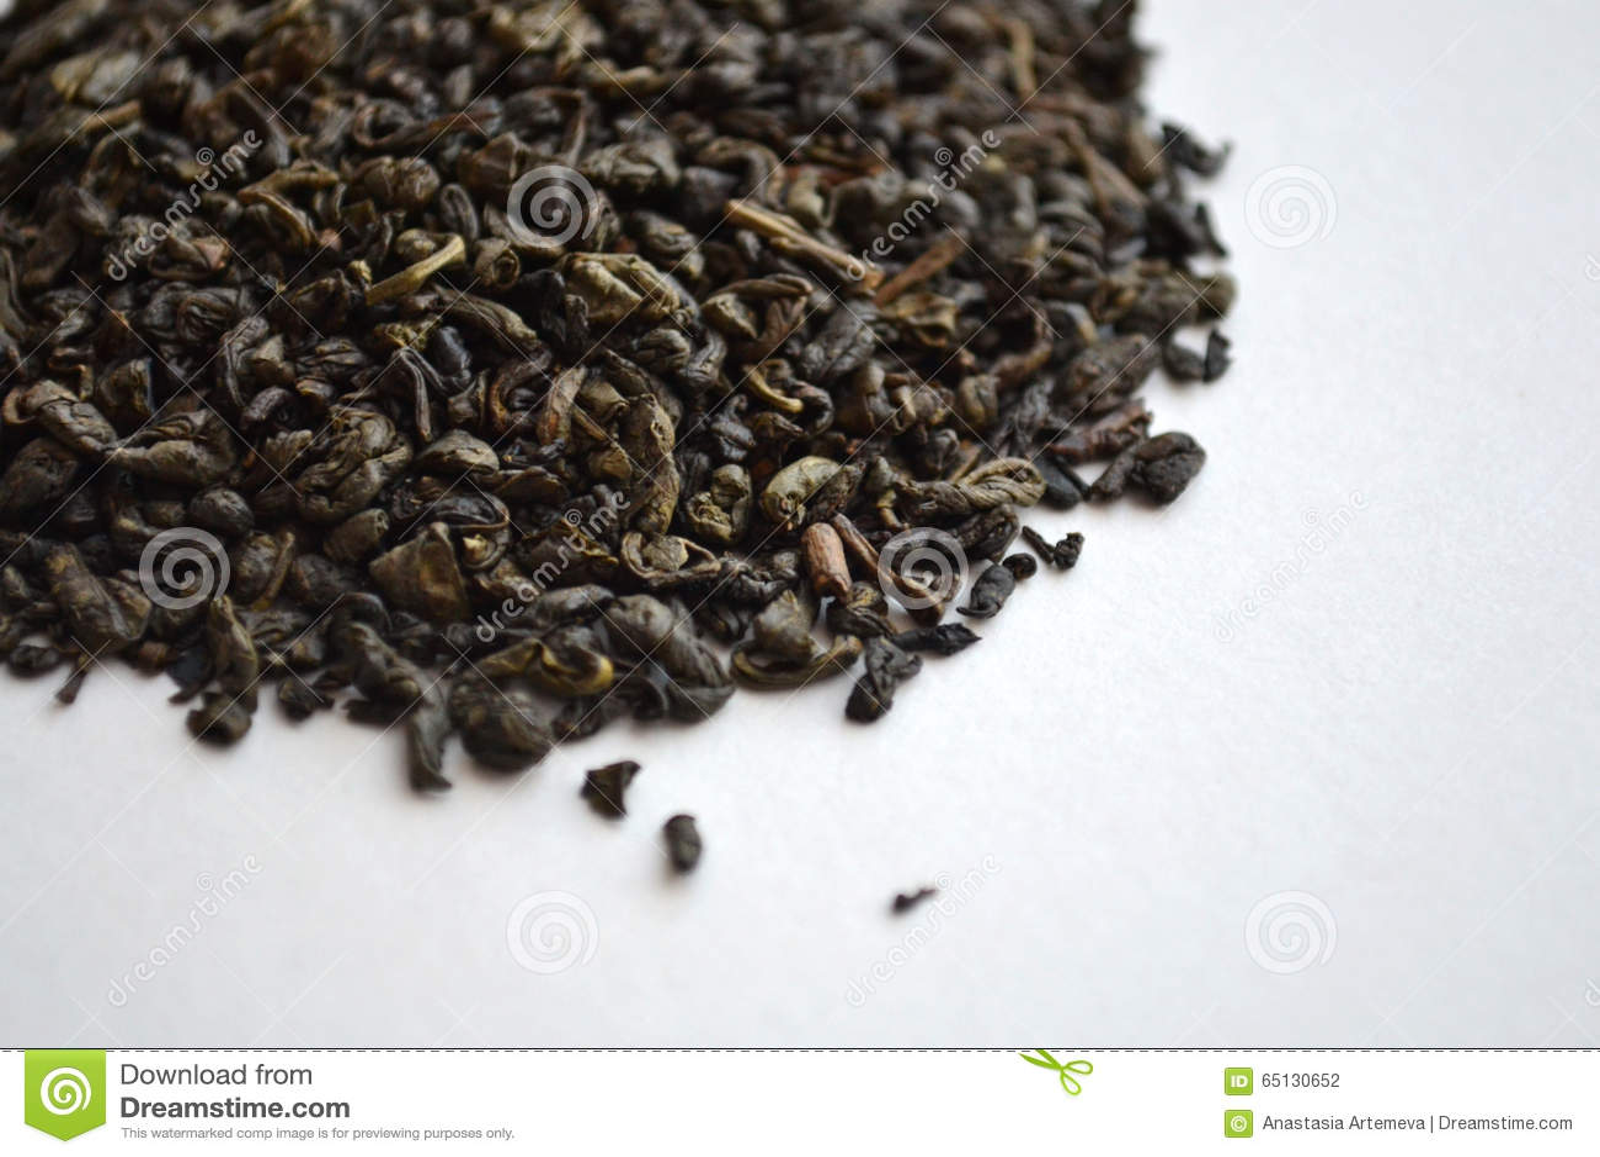 Chá verde da pólvora chinesa